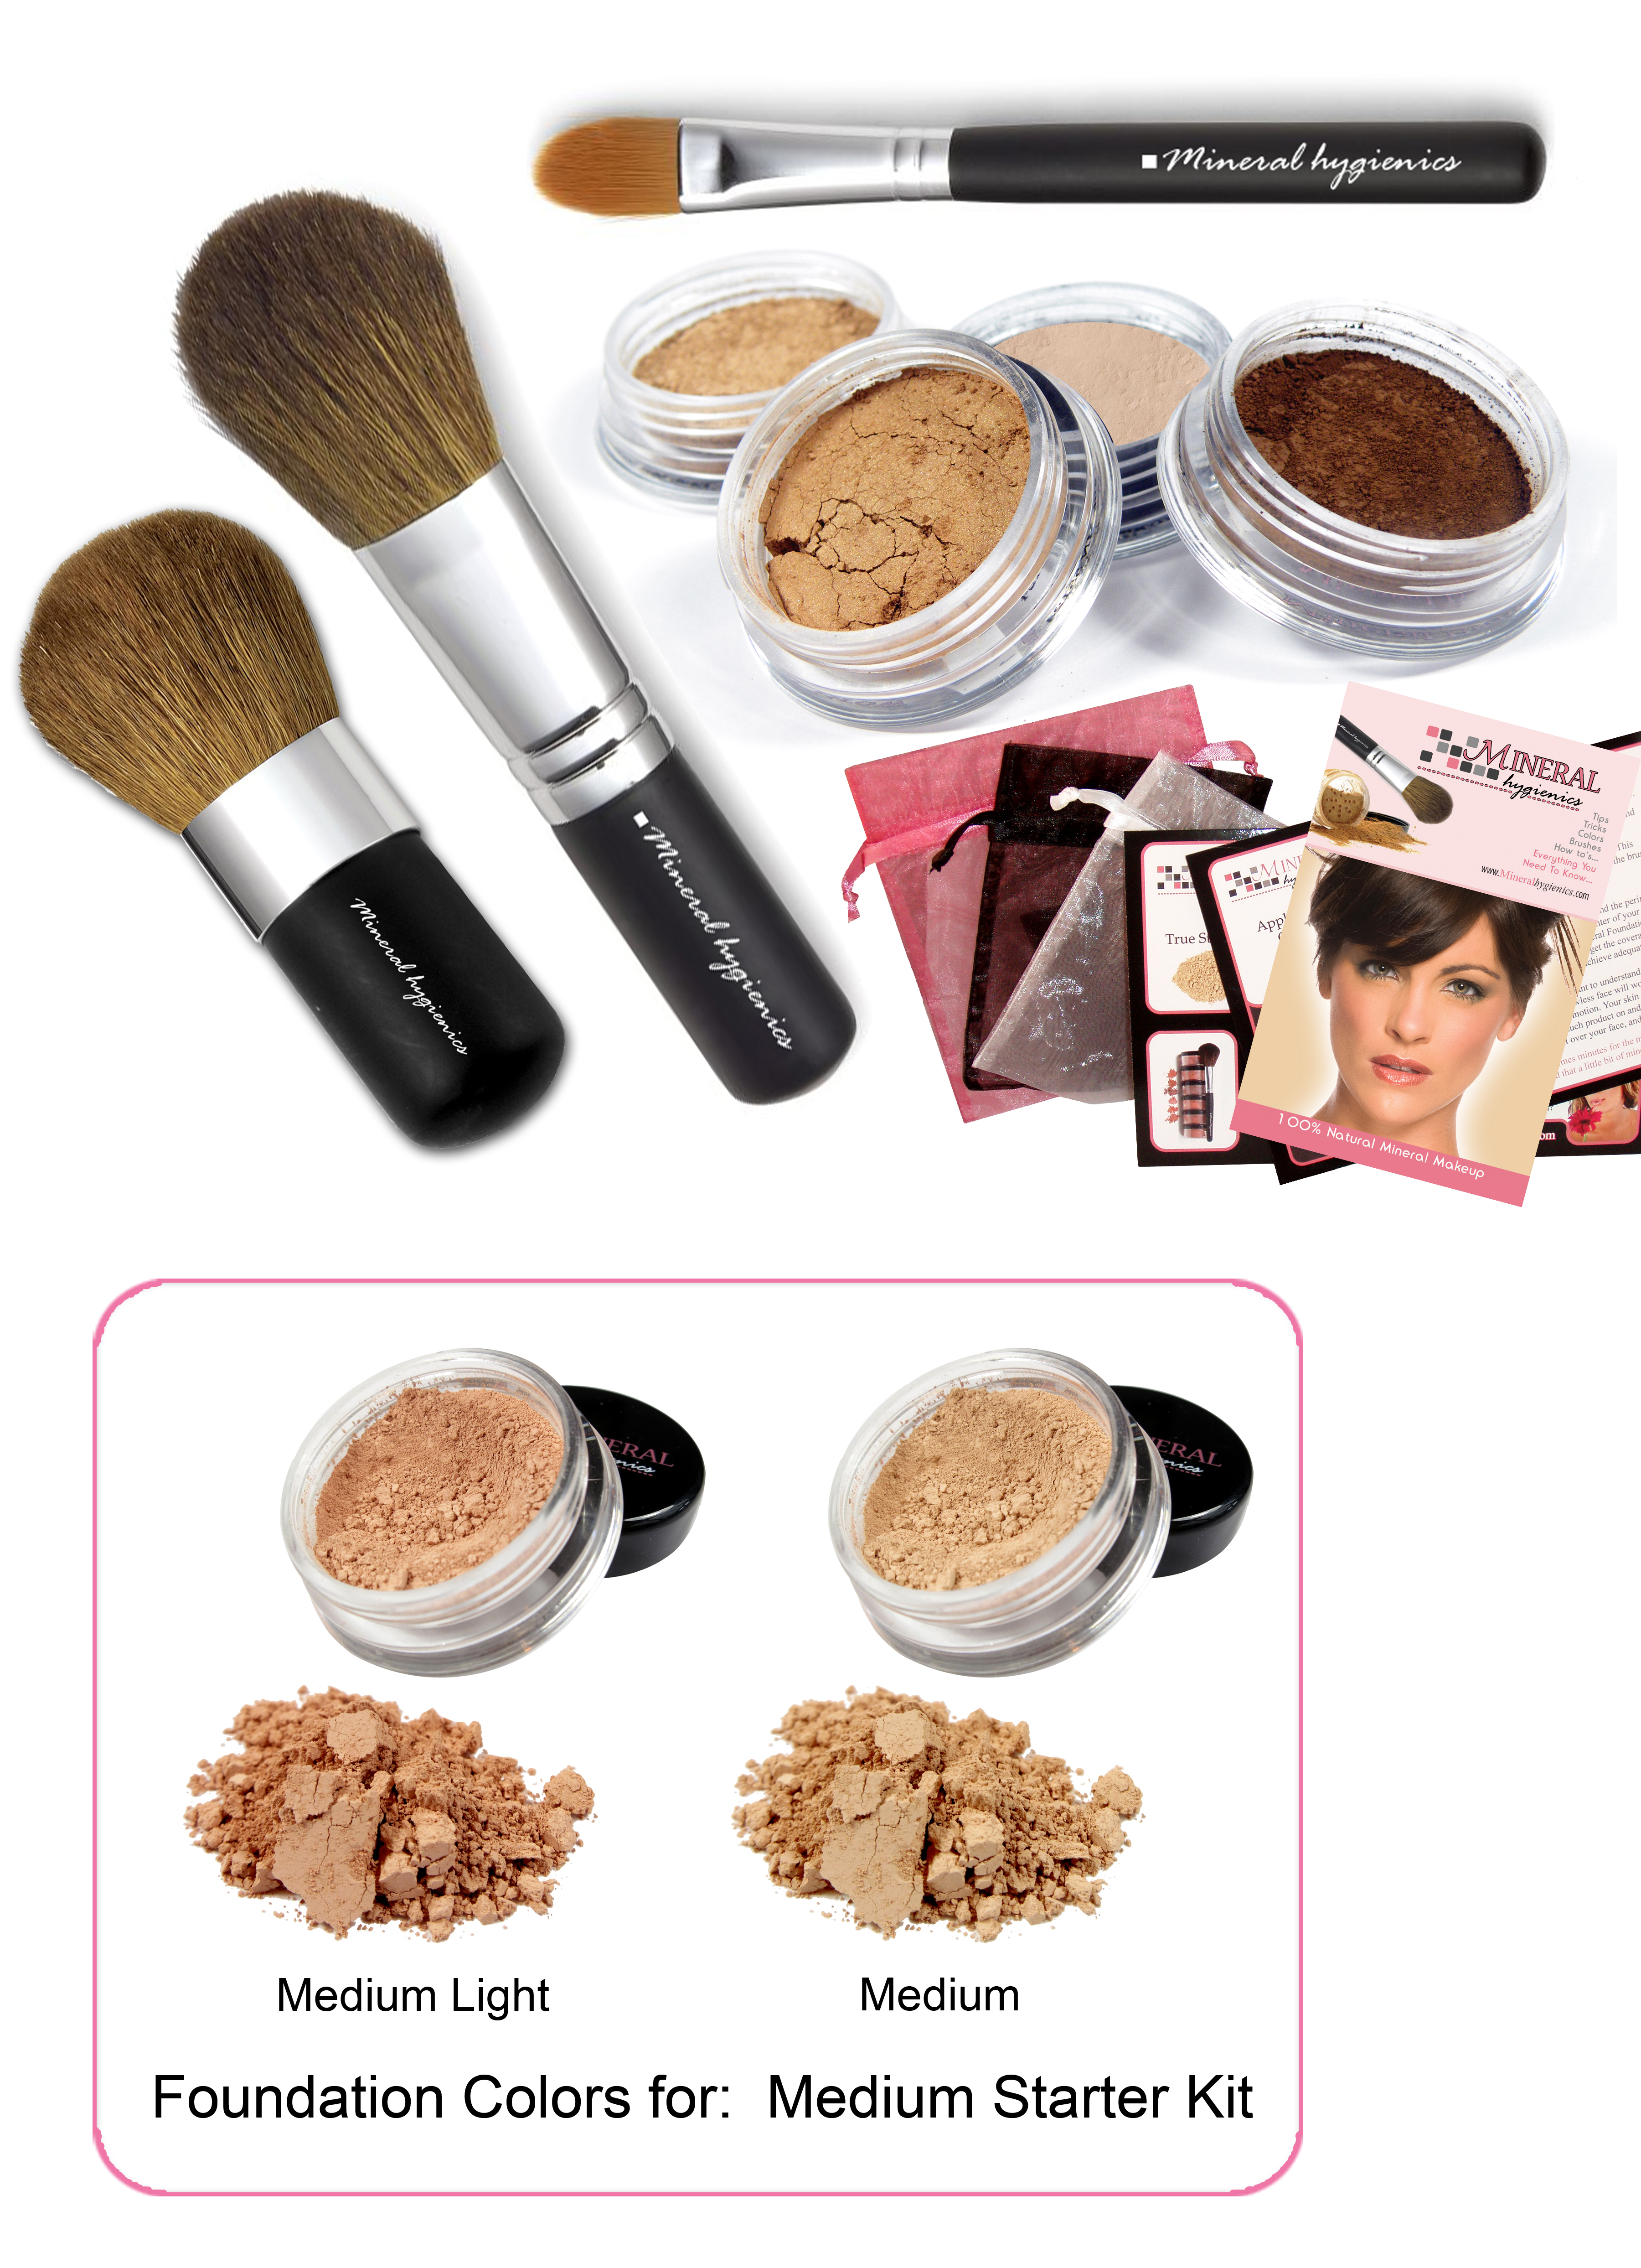 Mineral Makeup Starter Kit - Medium